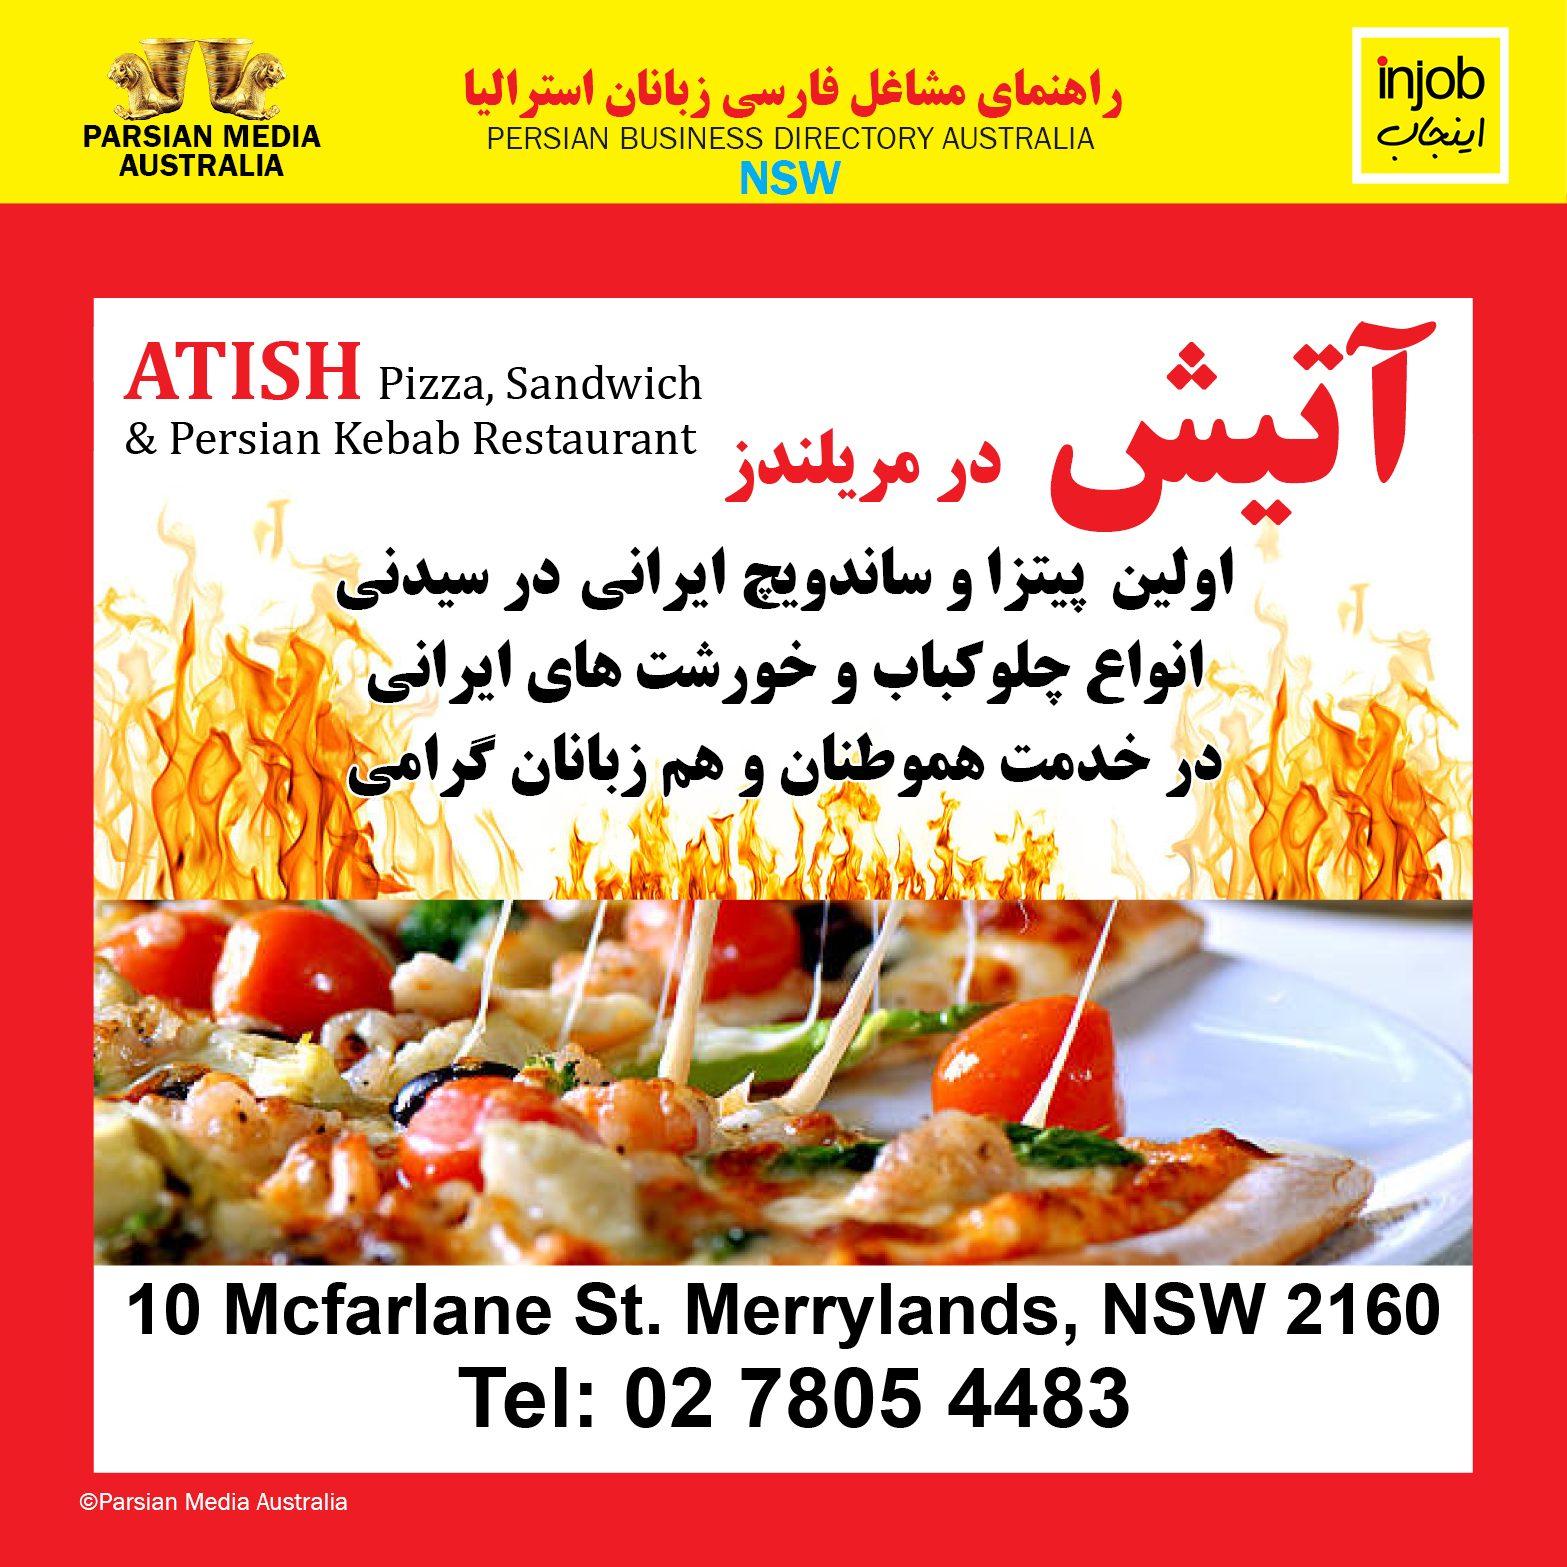 Atish Pizza-Injob 2021-online.jpg